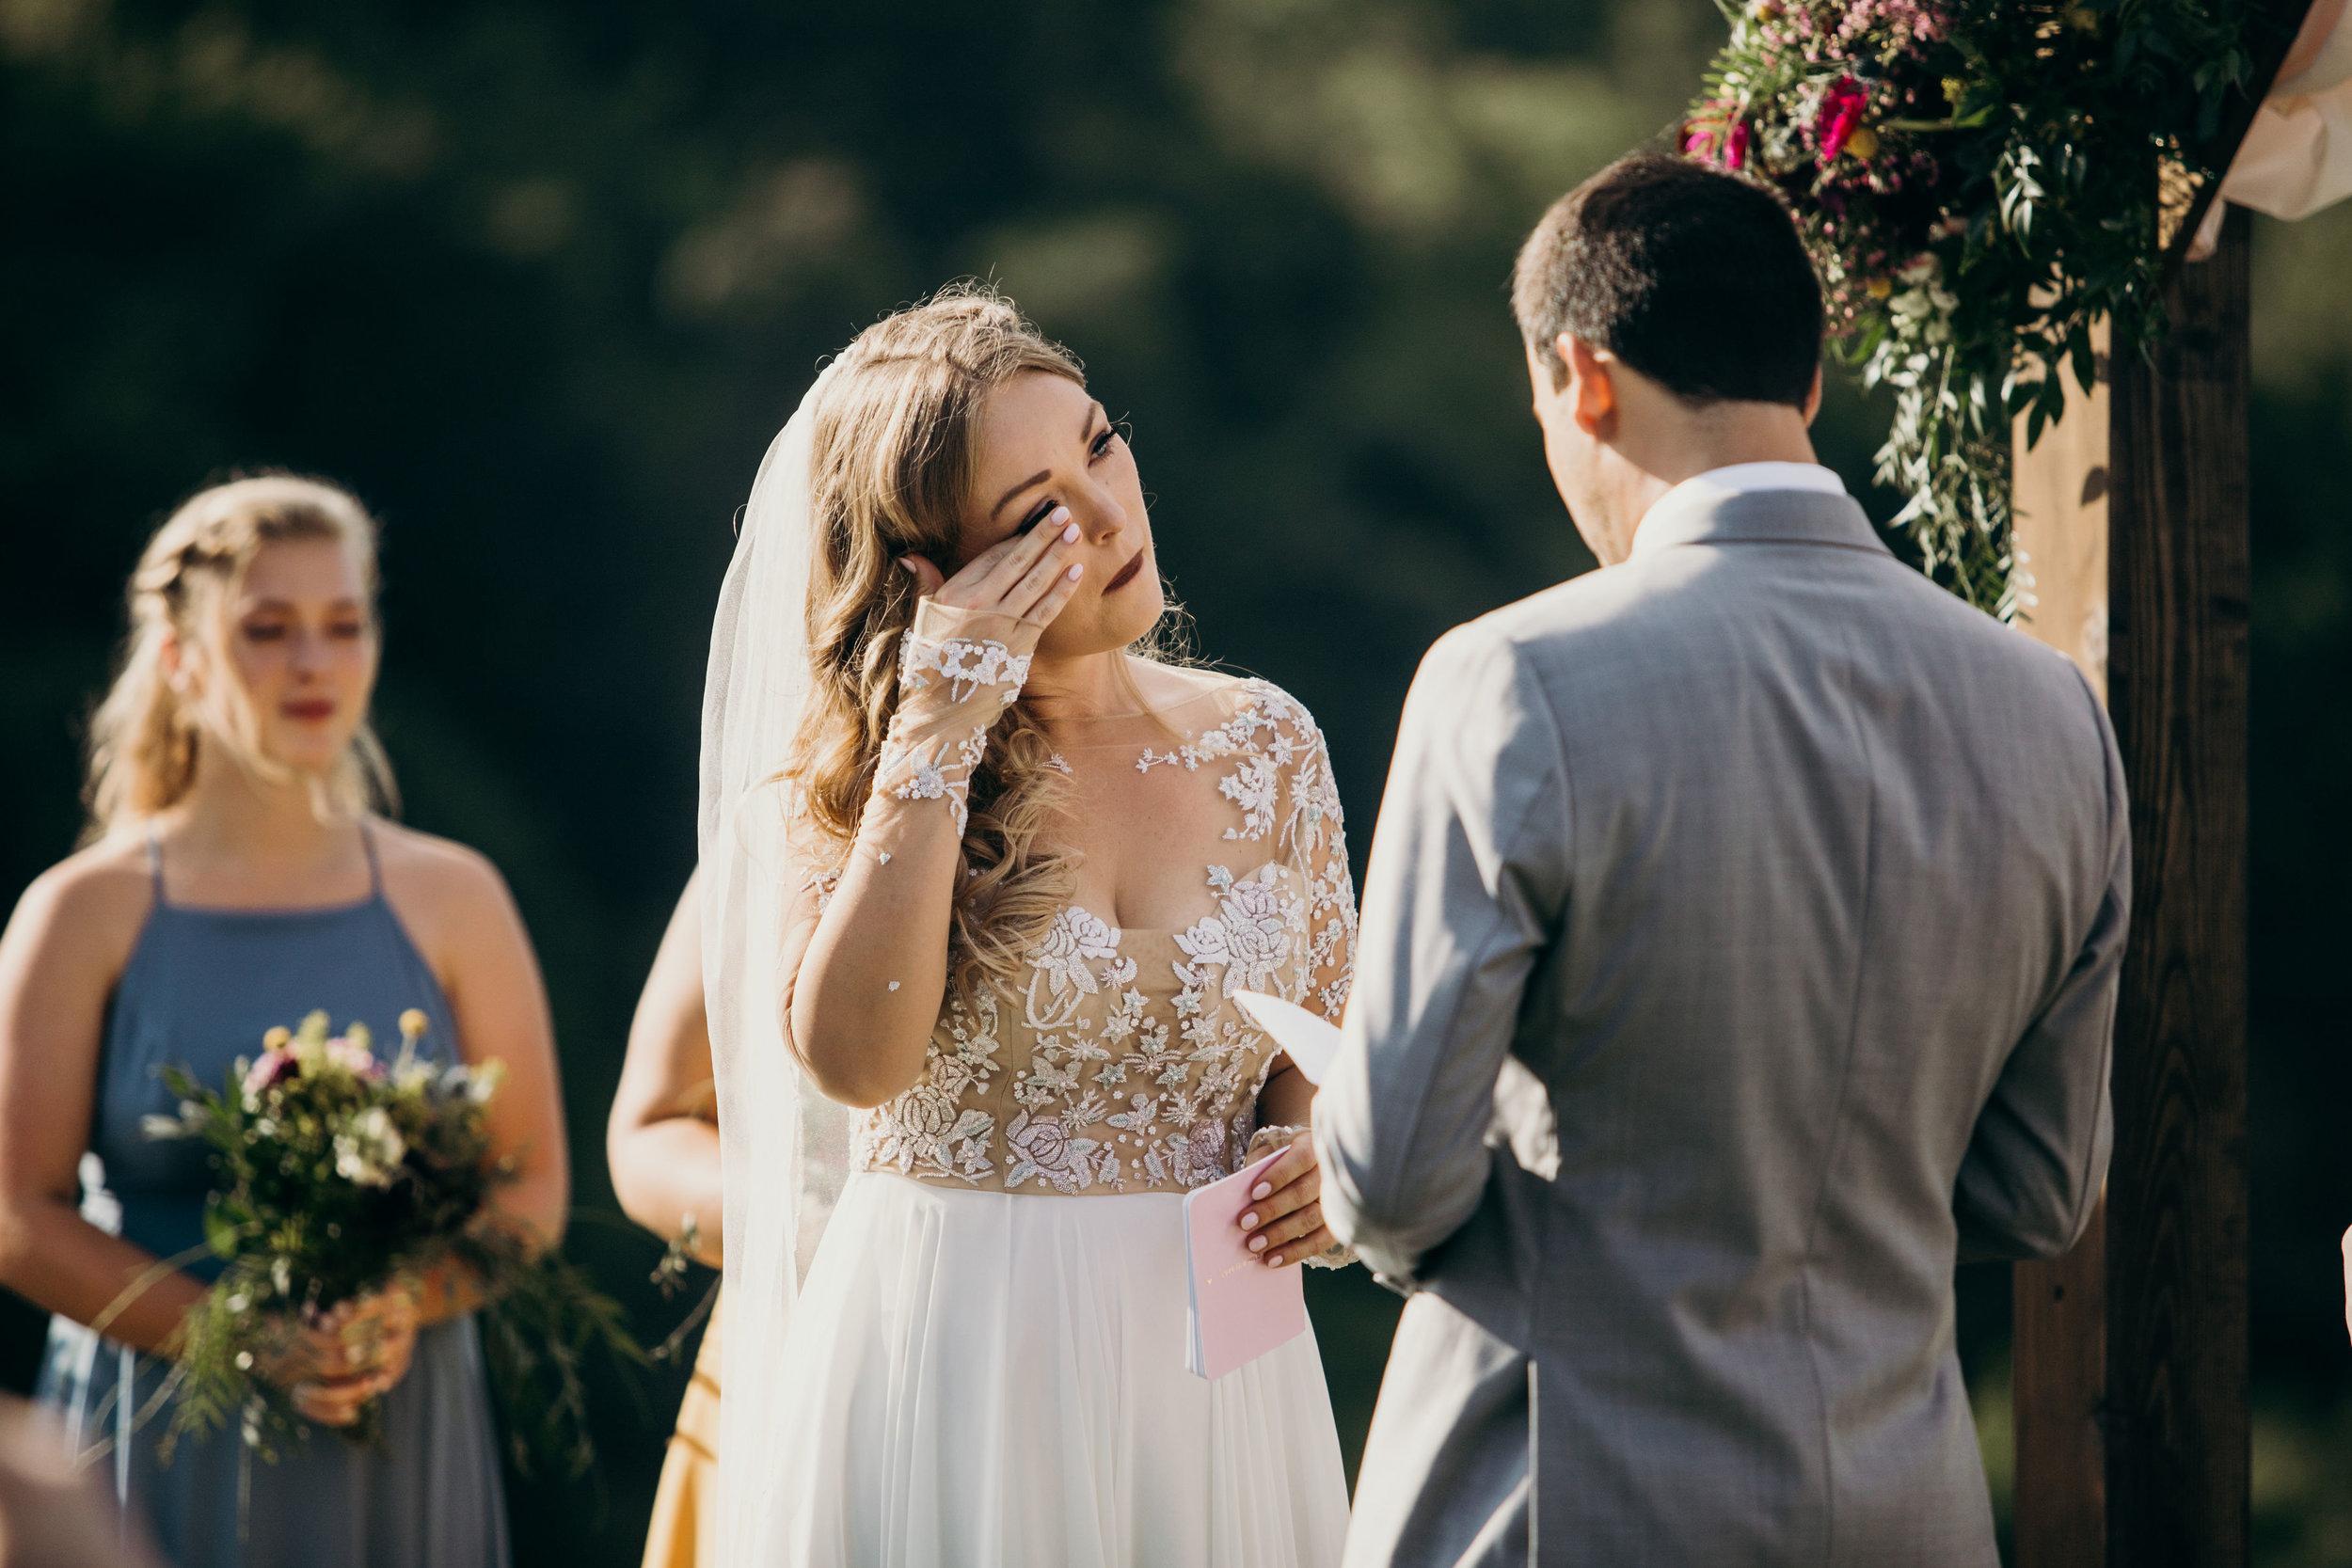 ryan-lauren-wedding-at-montfair-resort-farm-lindsey-paradiso-photography-9156.jpg